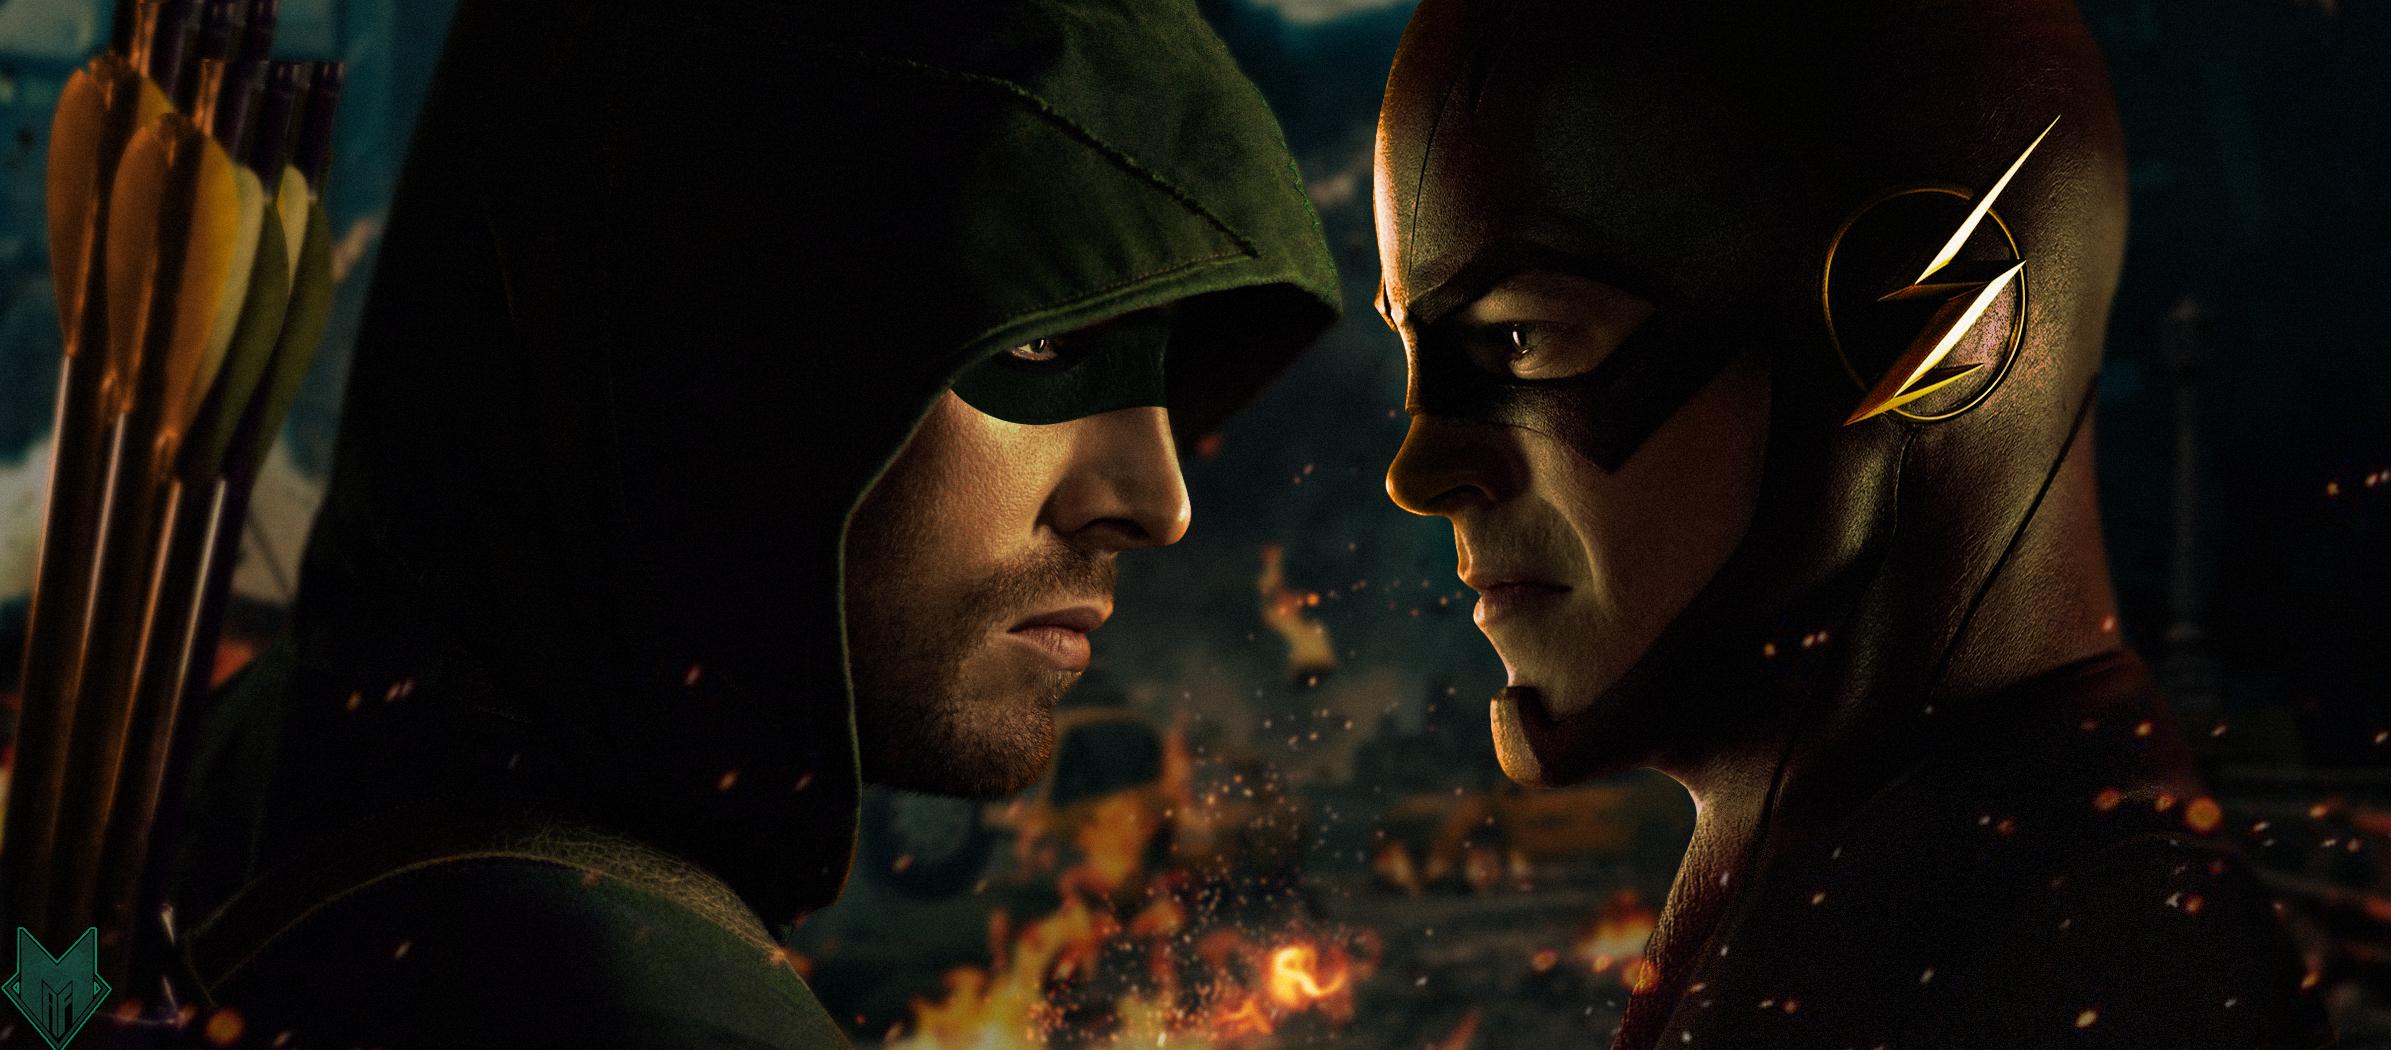 Flash vs Arrow HD Desktop Wallpapers digitalhintnet 2391x1050